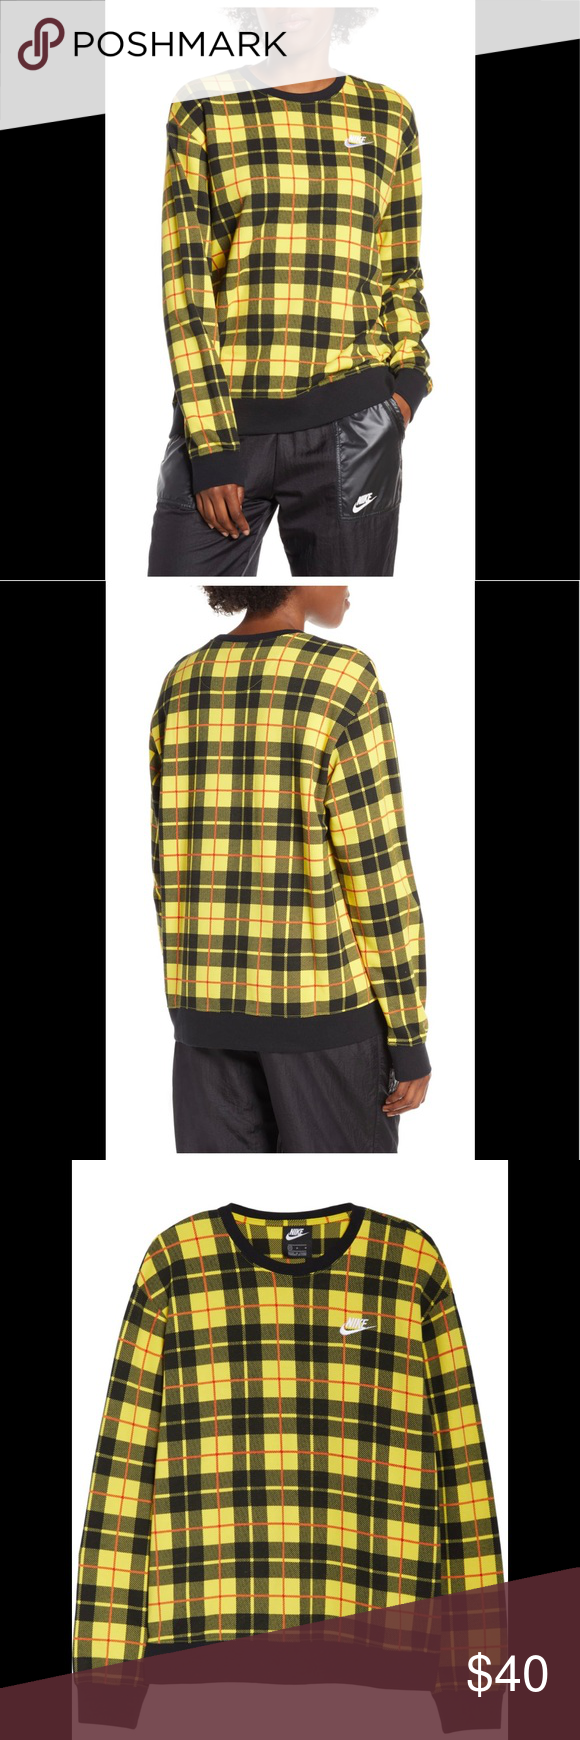 Nwt Nike Plaid Crewneck Sweatshirt Size M Crew Neck Sweatshirt Long Sleeve Sweatshirts Sweatshirts [ 1740 x 580 Pixel ]